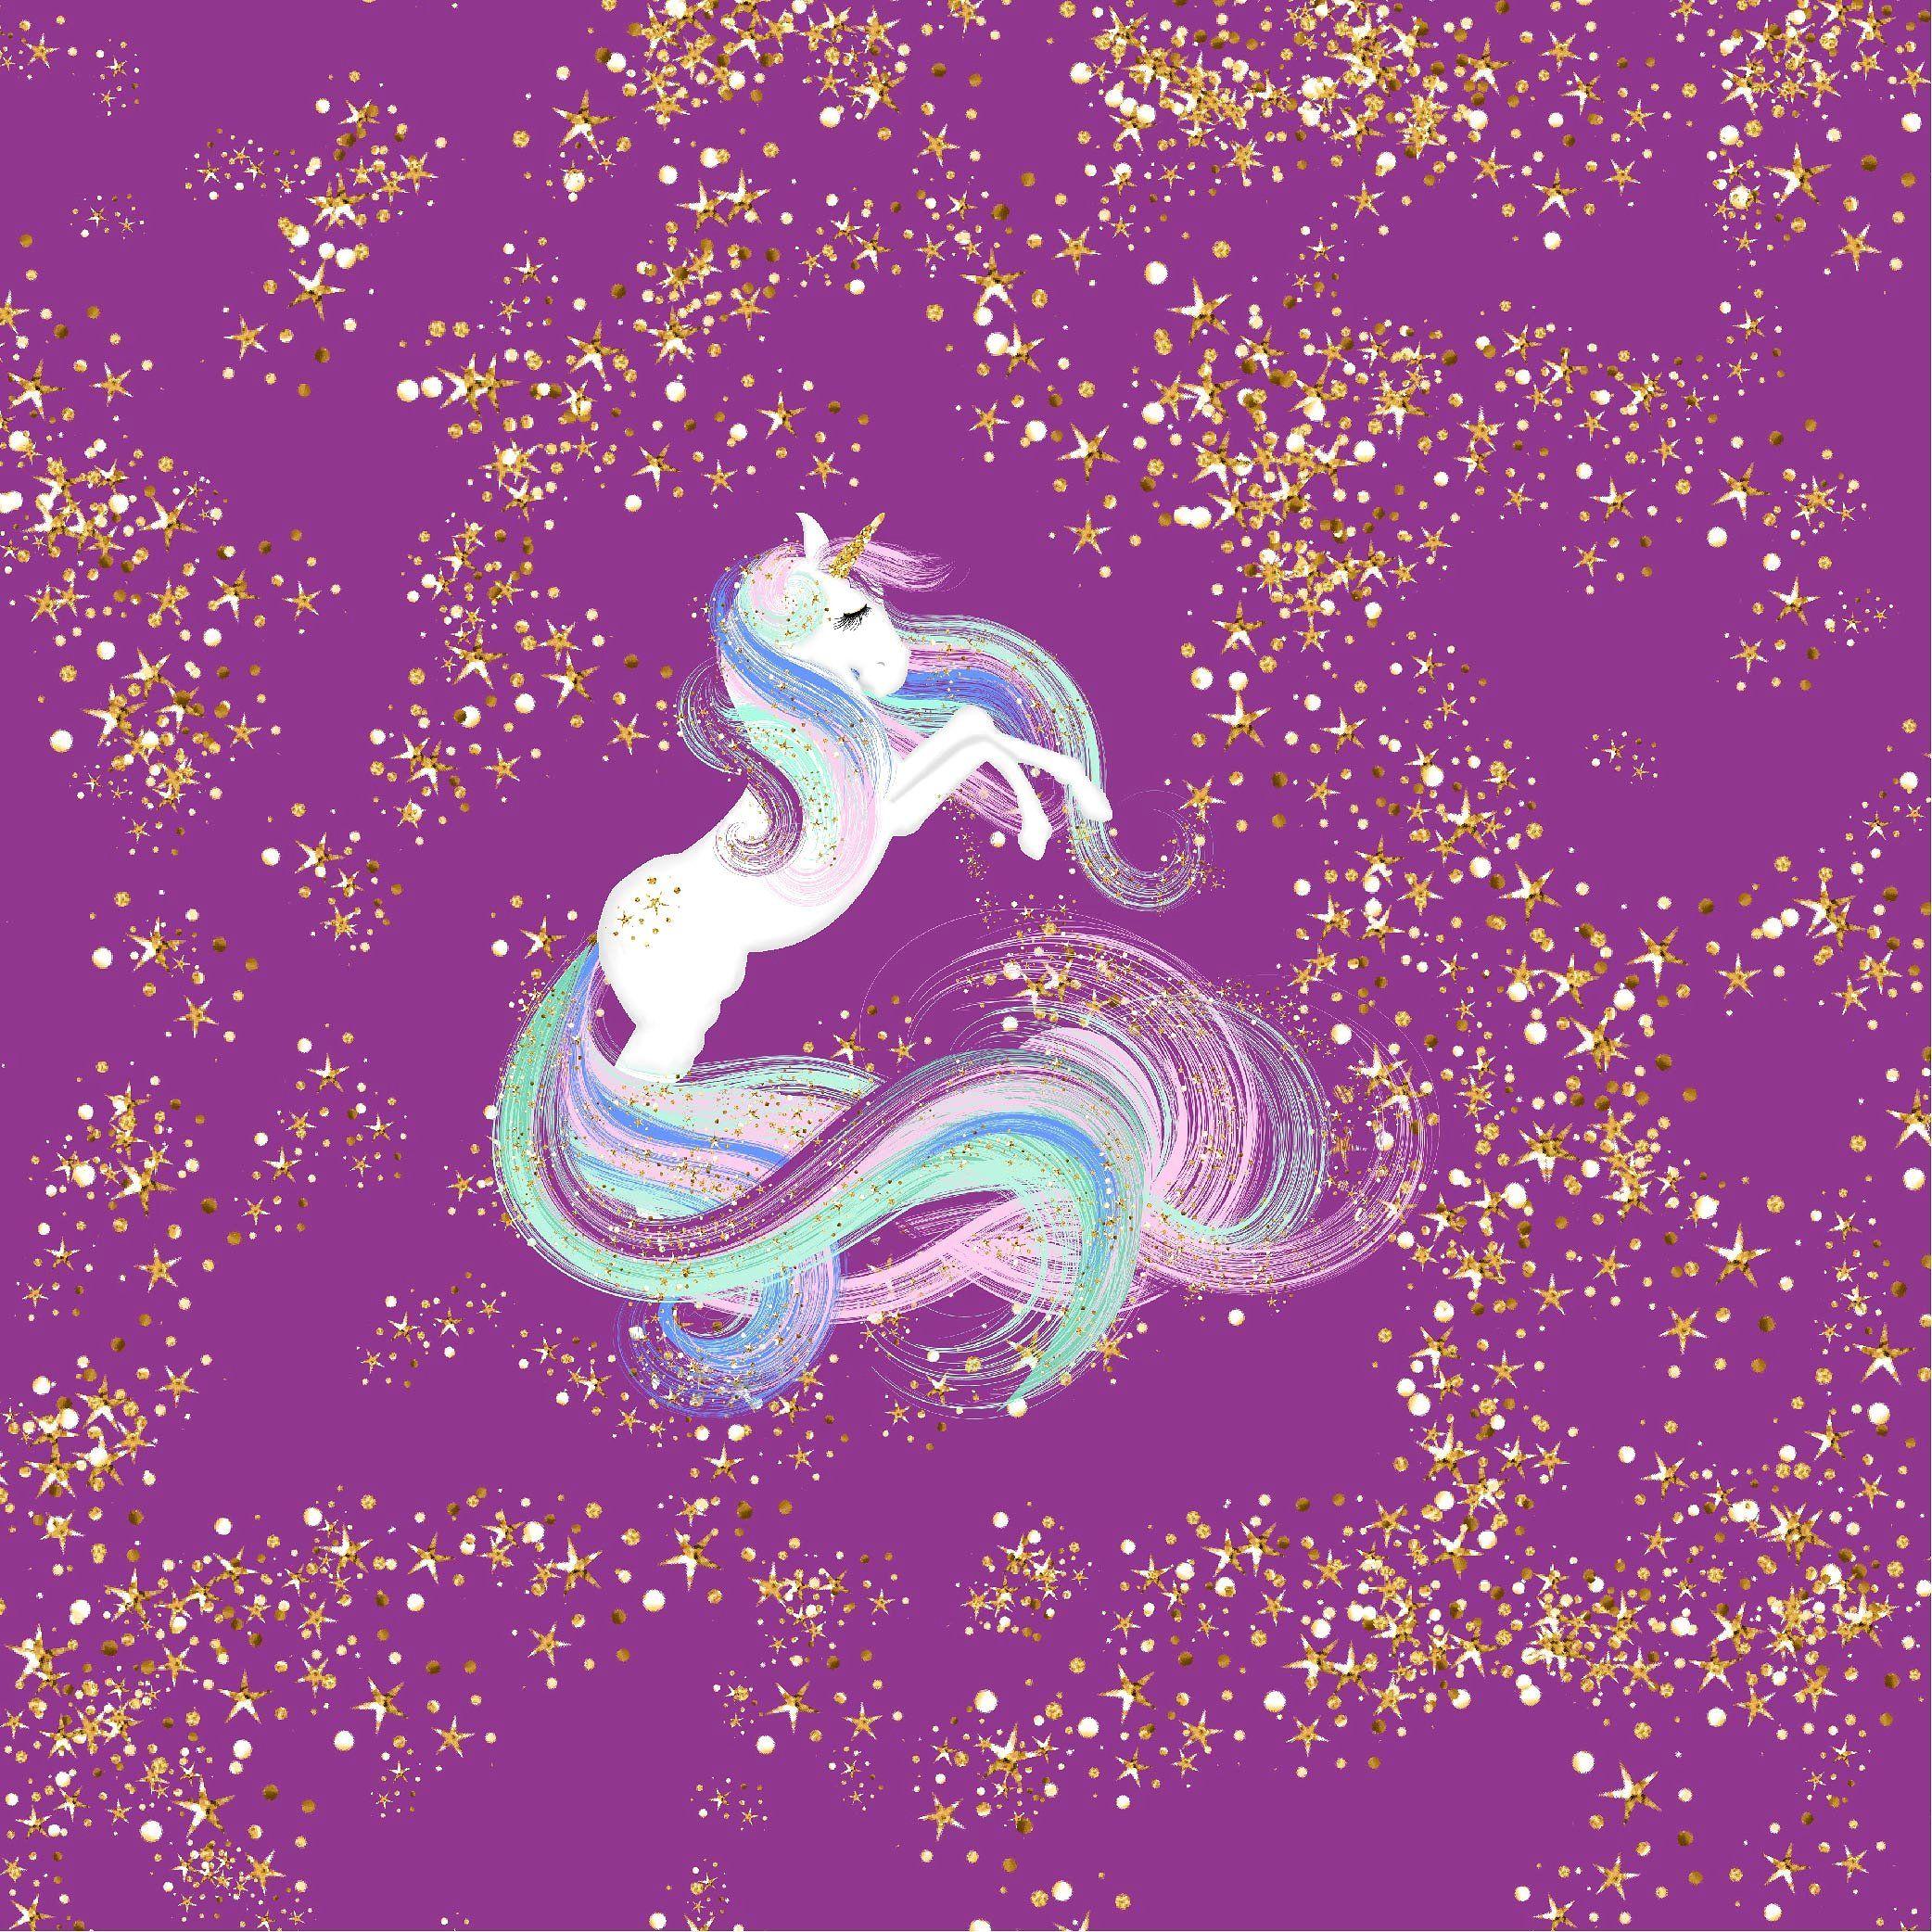 Gold Glitter Unicorn Digital Paper Unicorn Wallpaper Unicorn Art Unicorn Pictures